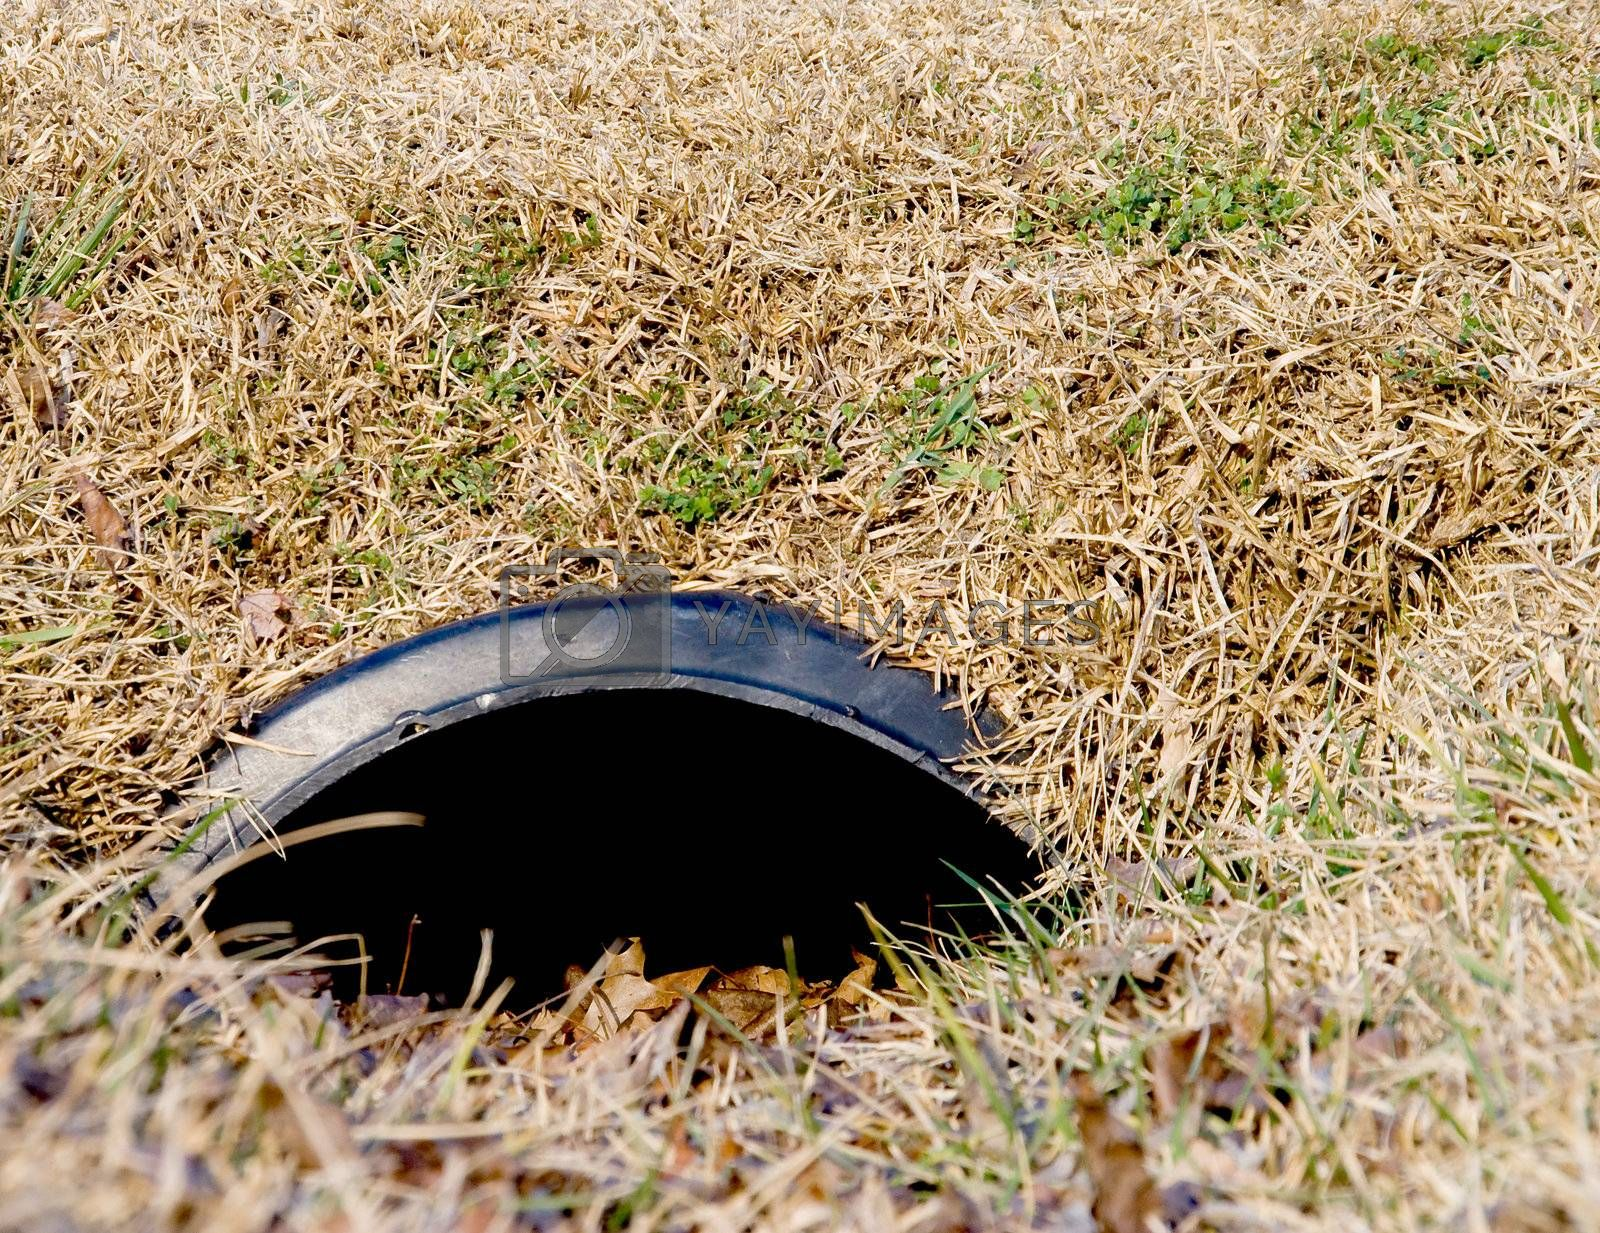 A drainage pipe in a roadside ditch.